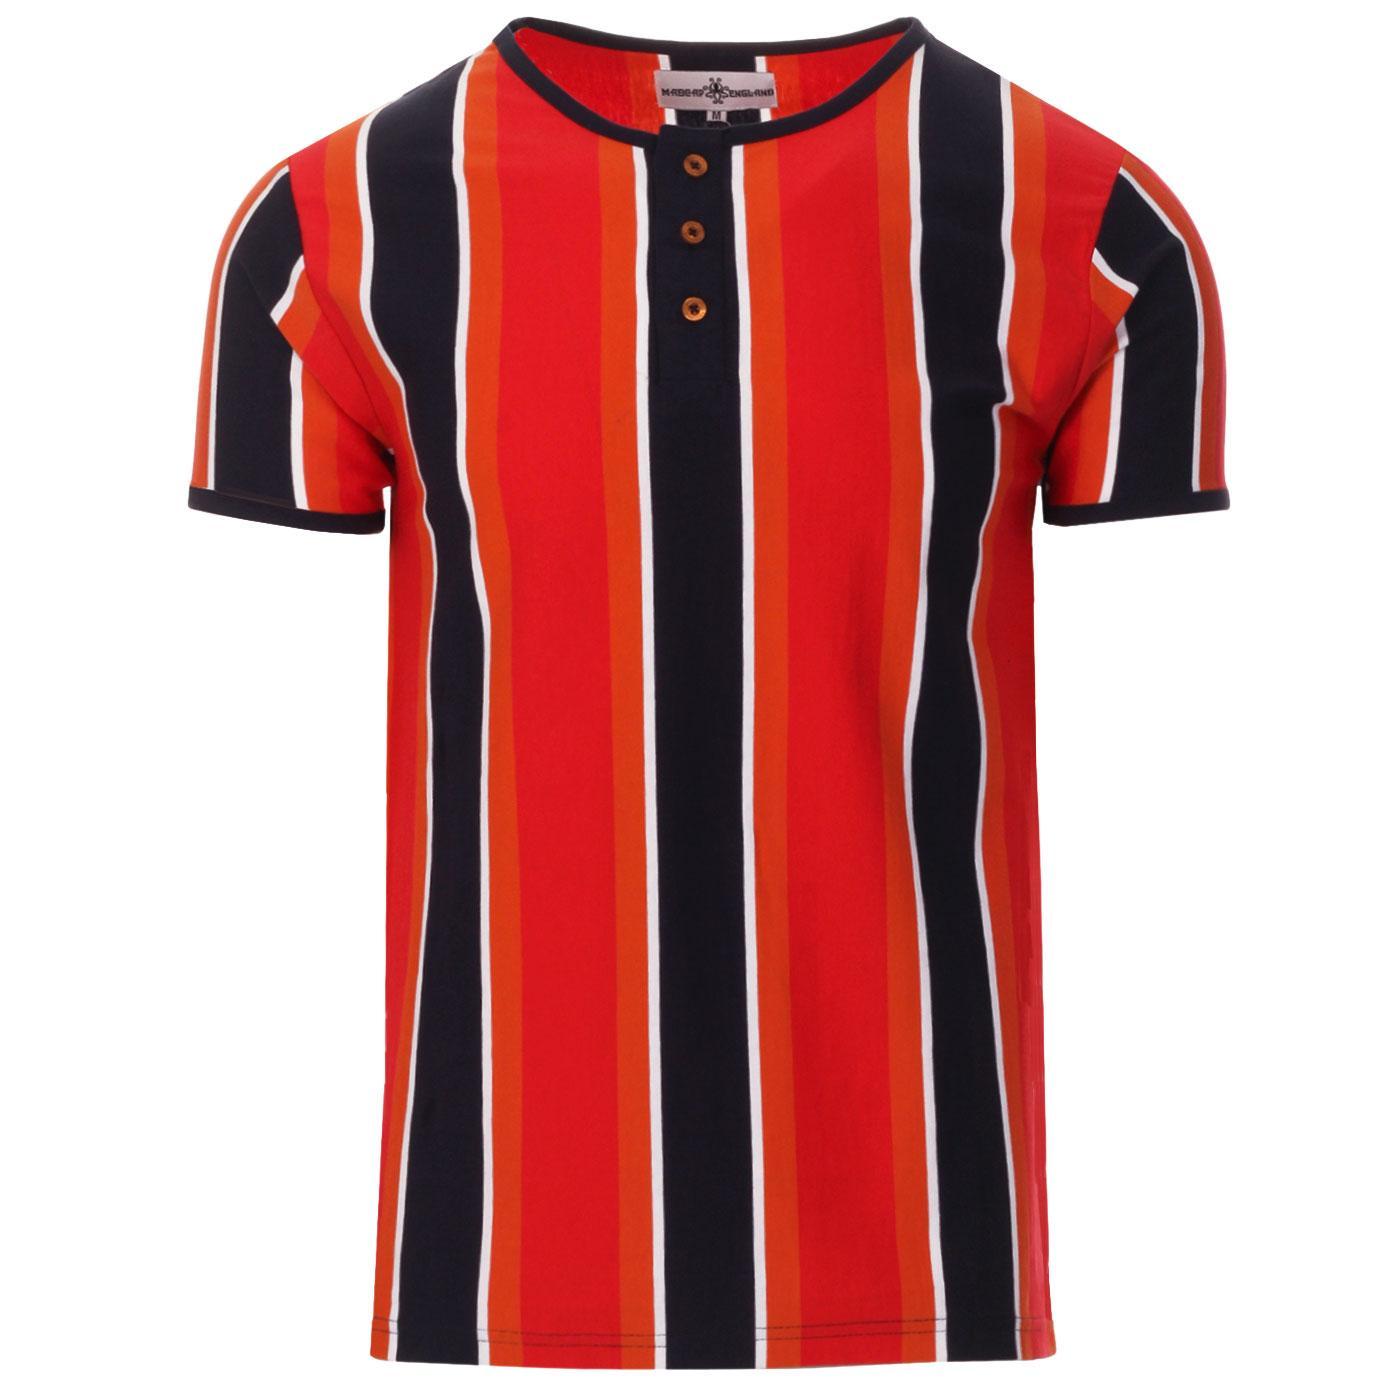 Madcap England Winstono Men's 60s Mod Stripe Grandad T-shirt in Poppy